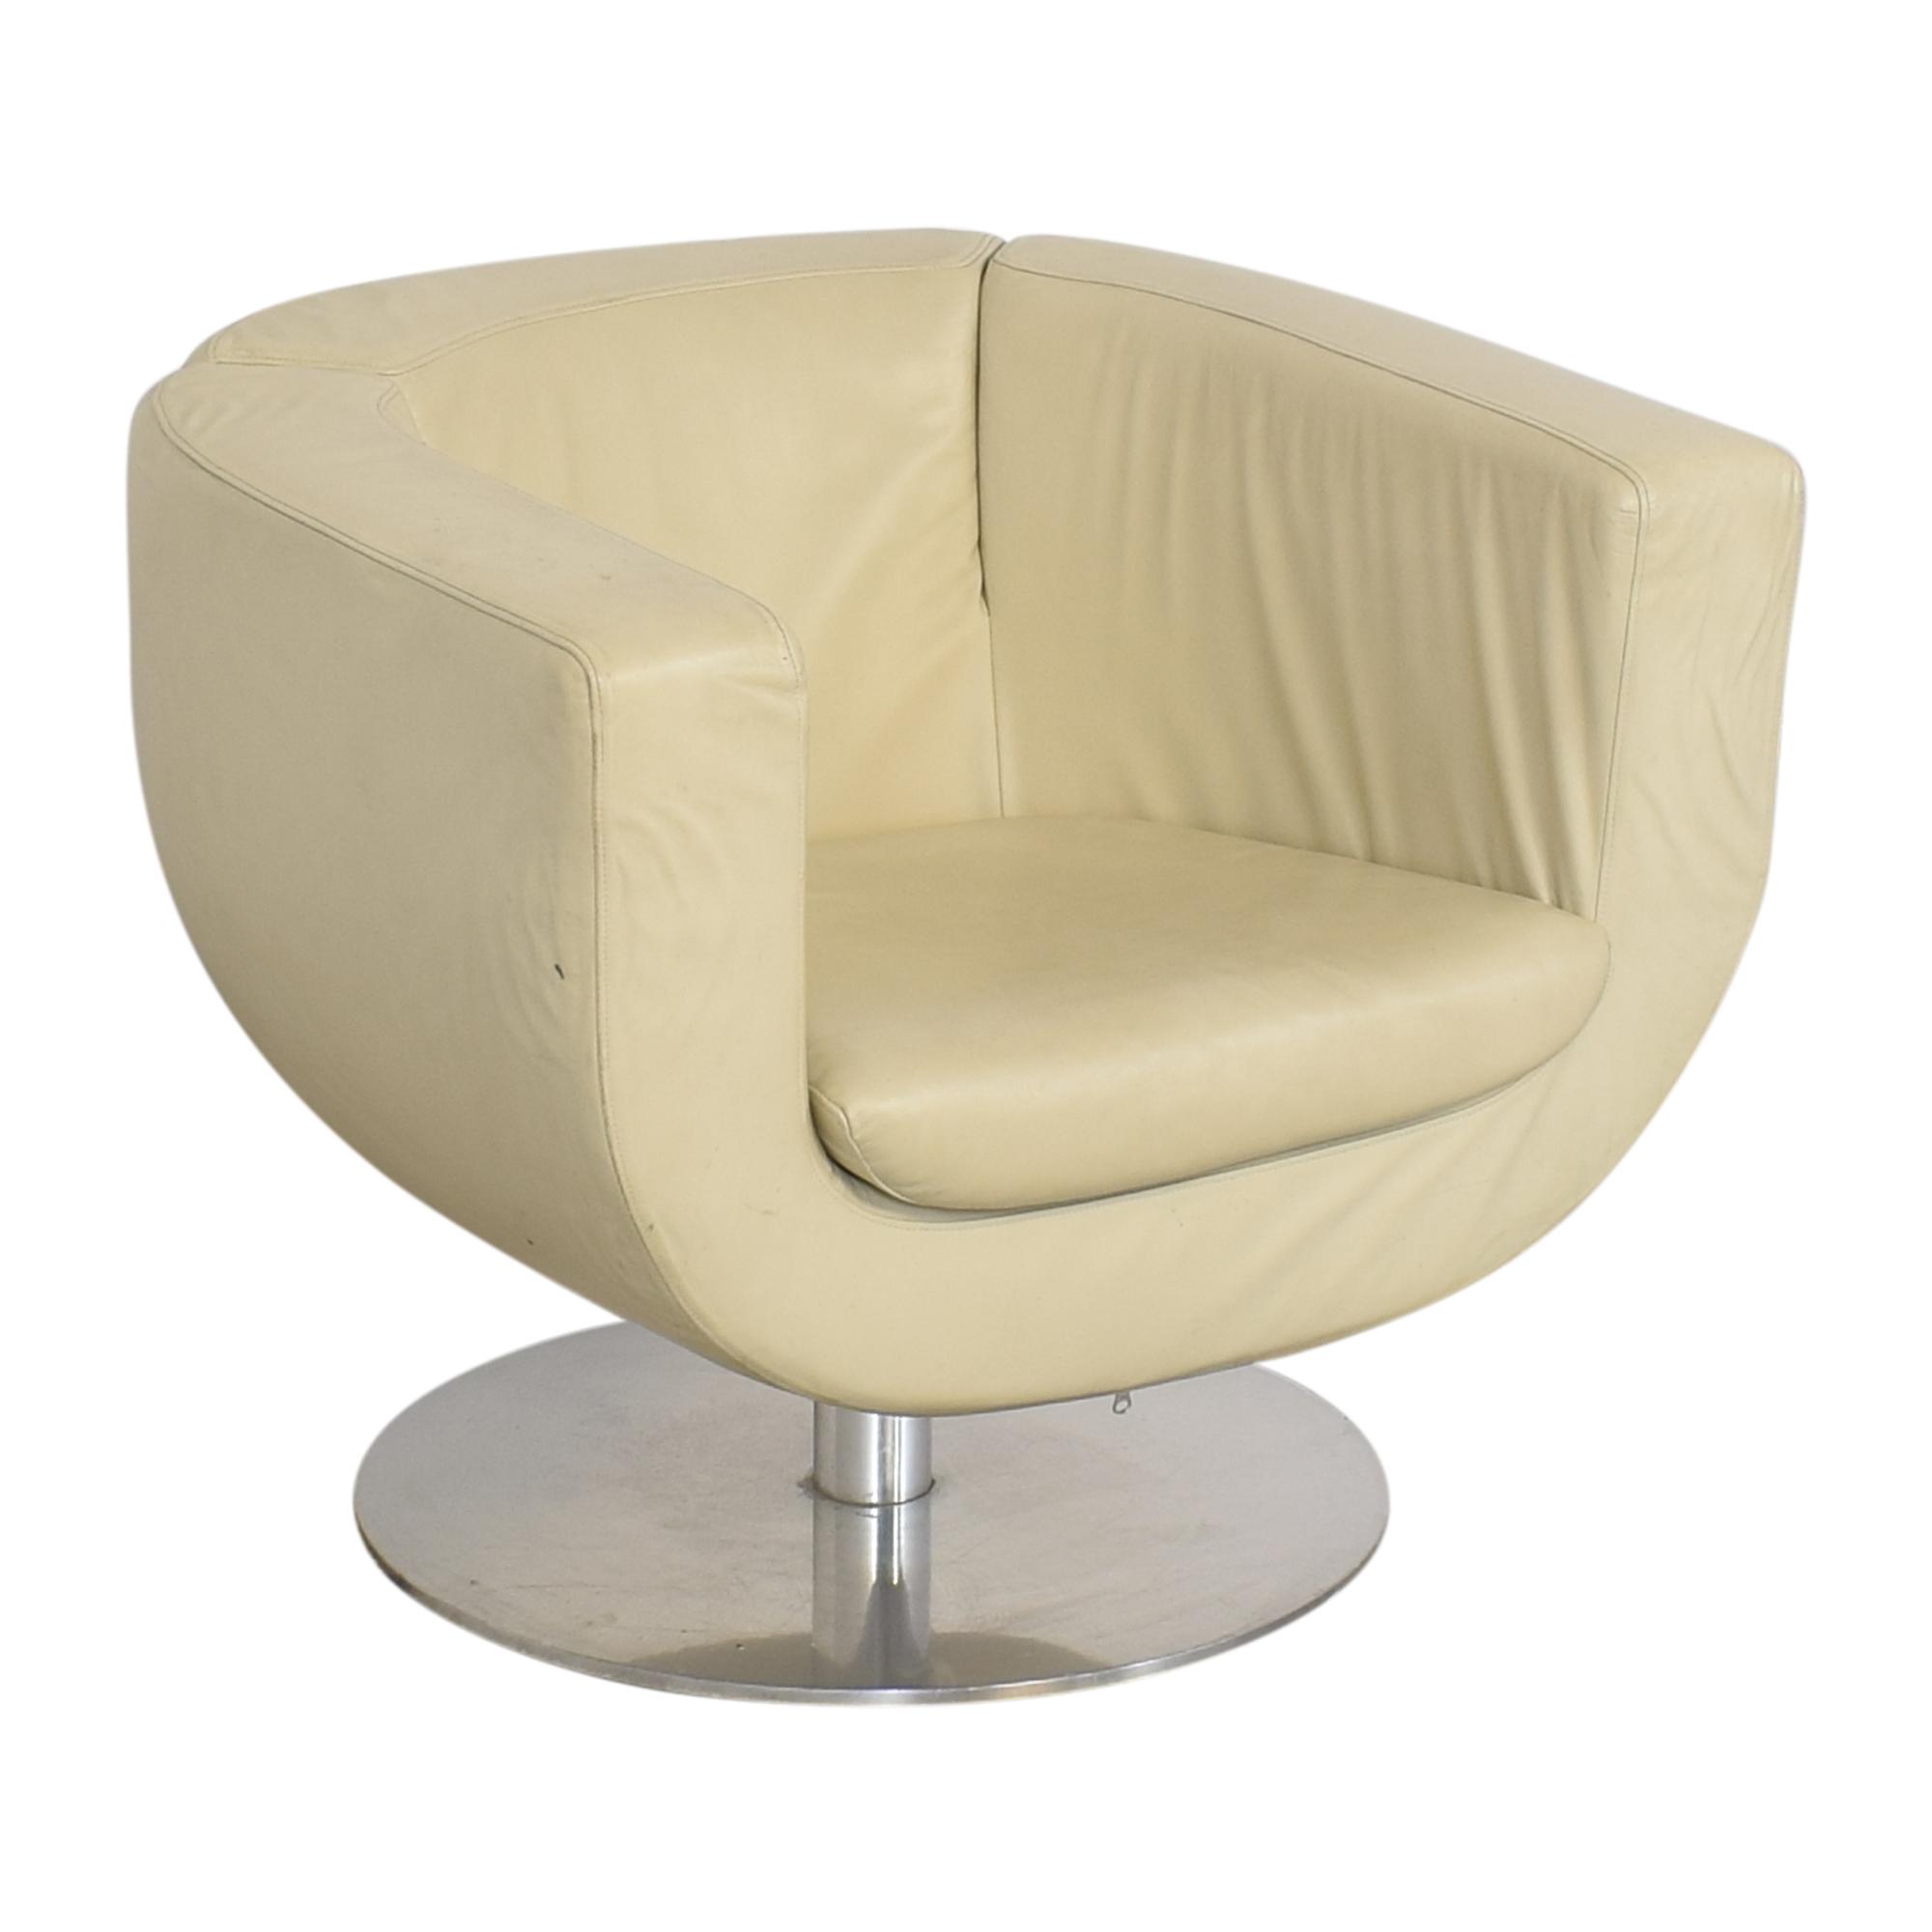 B&B Italia Jeffrey Bernett Tulip Swivel Chair sale